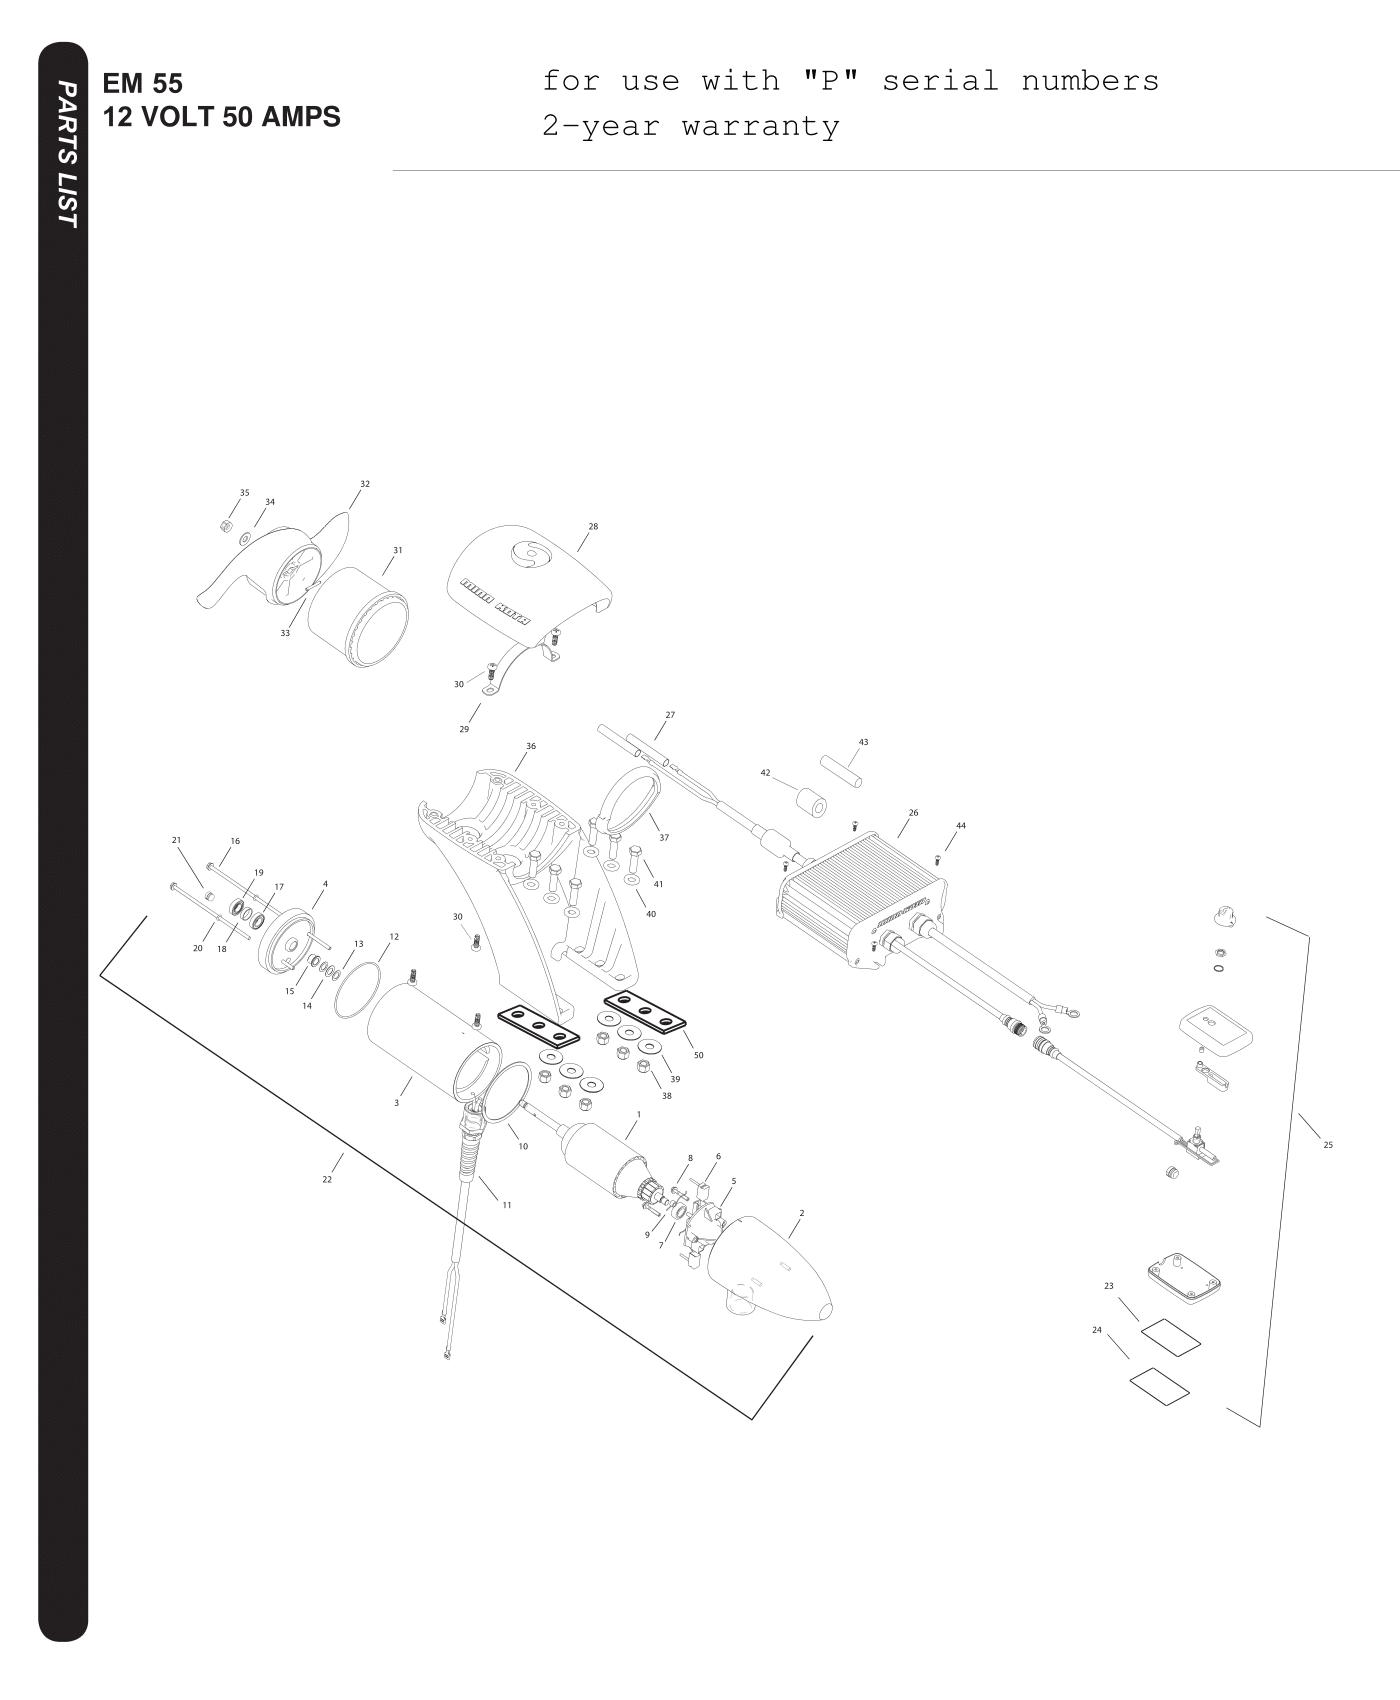 2015-mk-em55-1.png